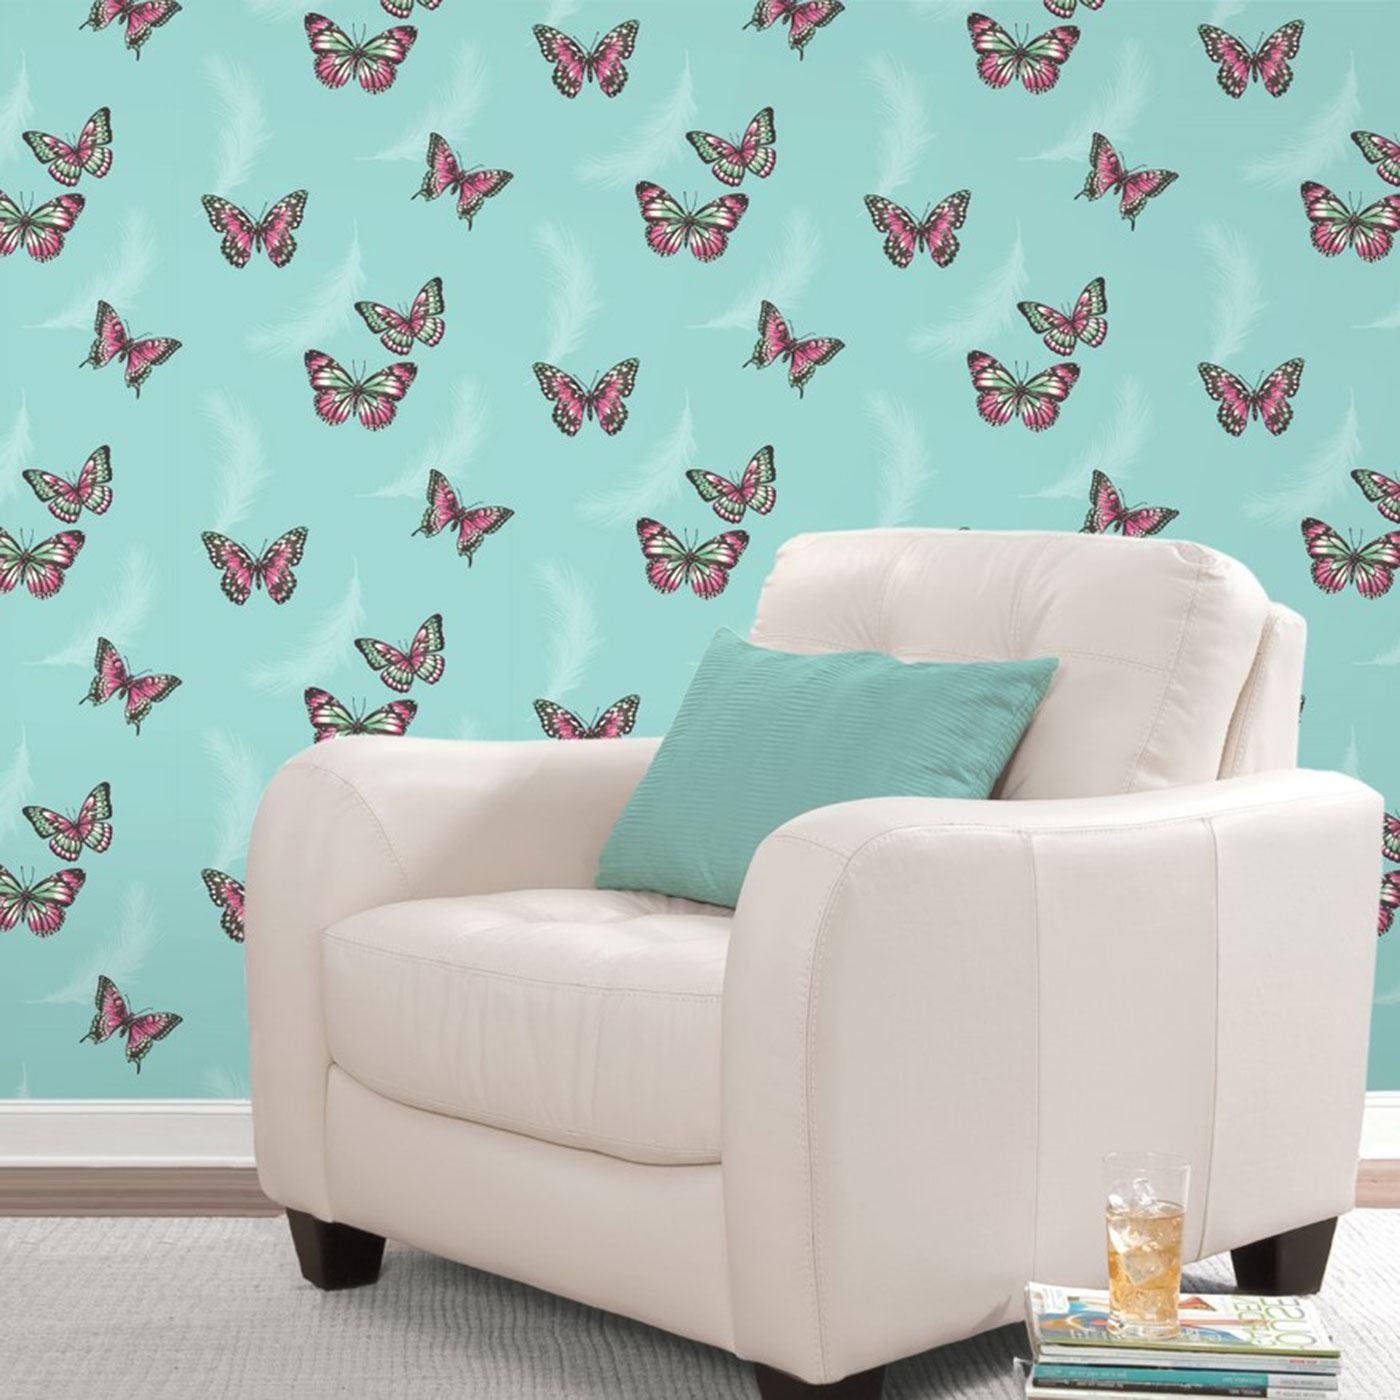 Girls Chic Wallpaper Kids Bedroom Feature Wall Decor